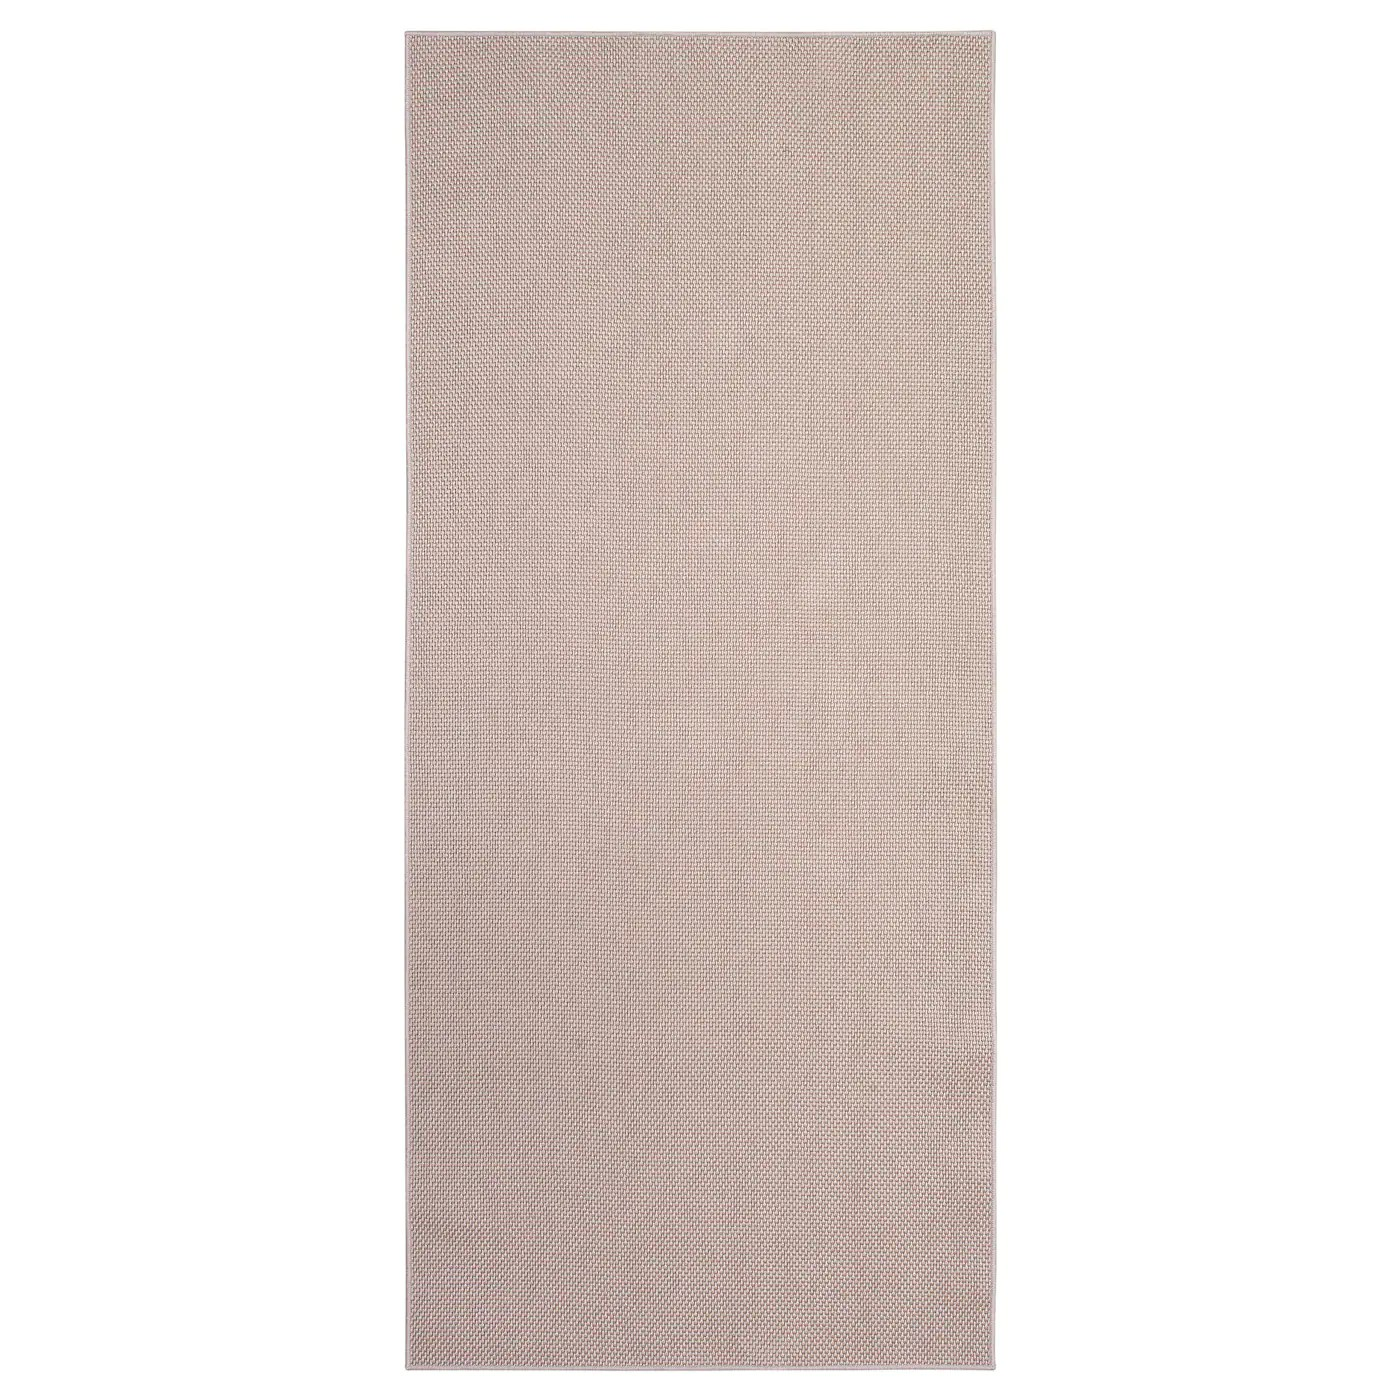 sollinge tapis tisse a plat beige 65x150 cm